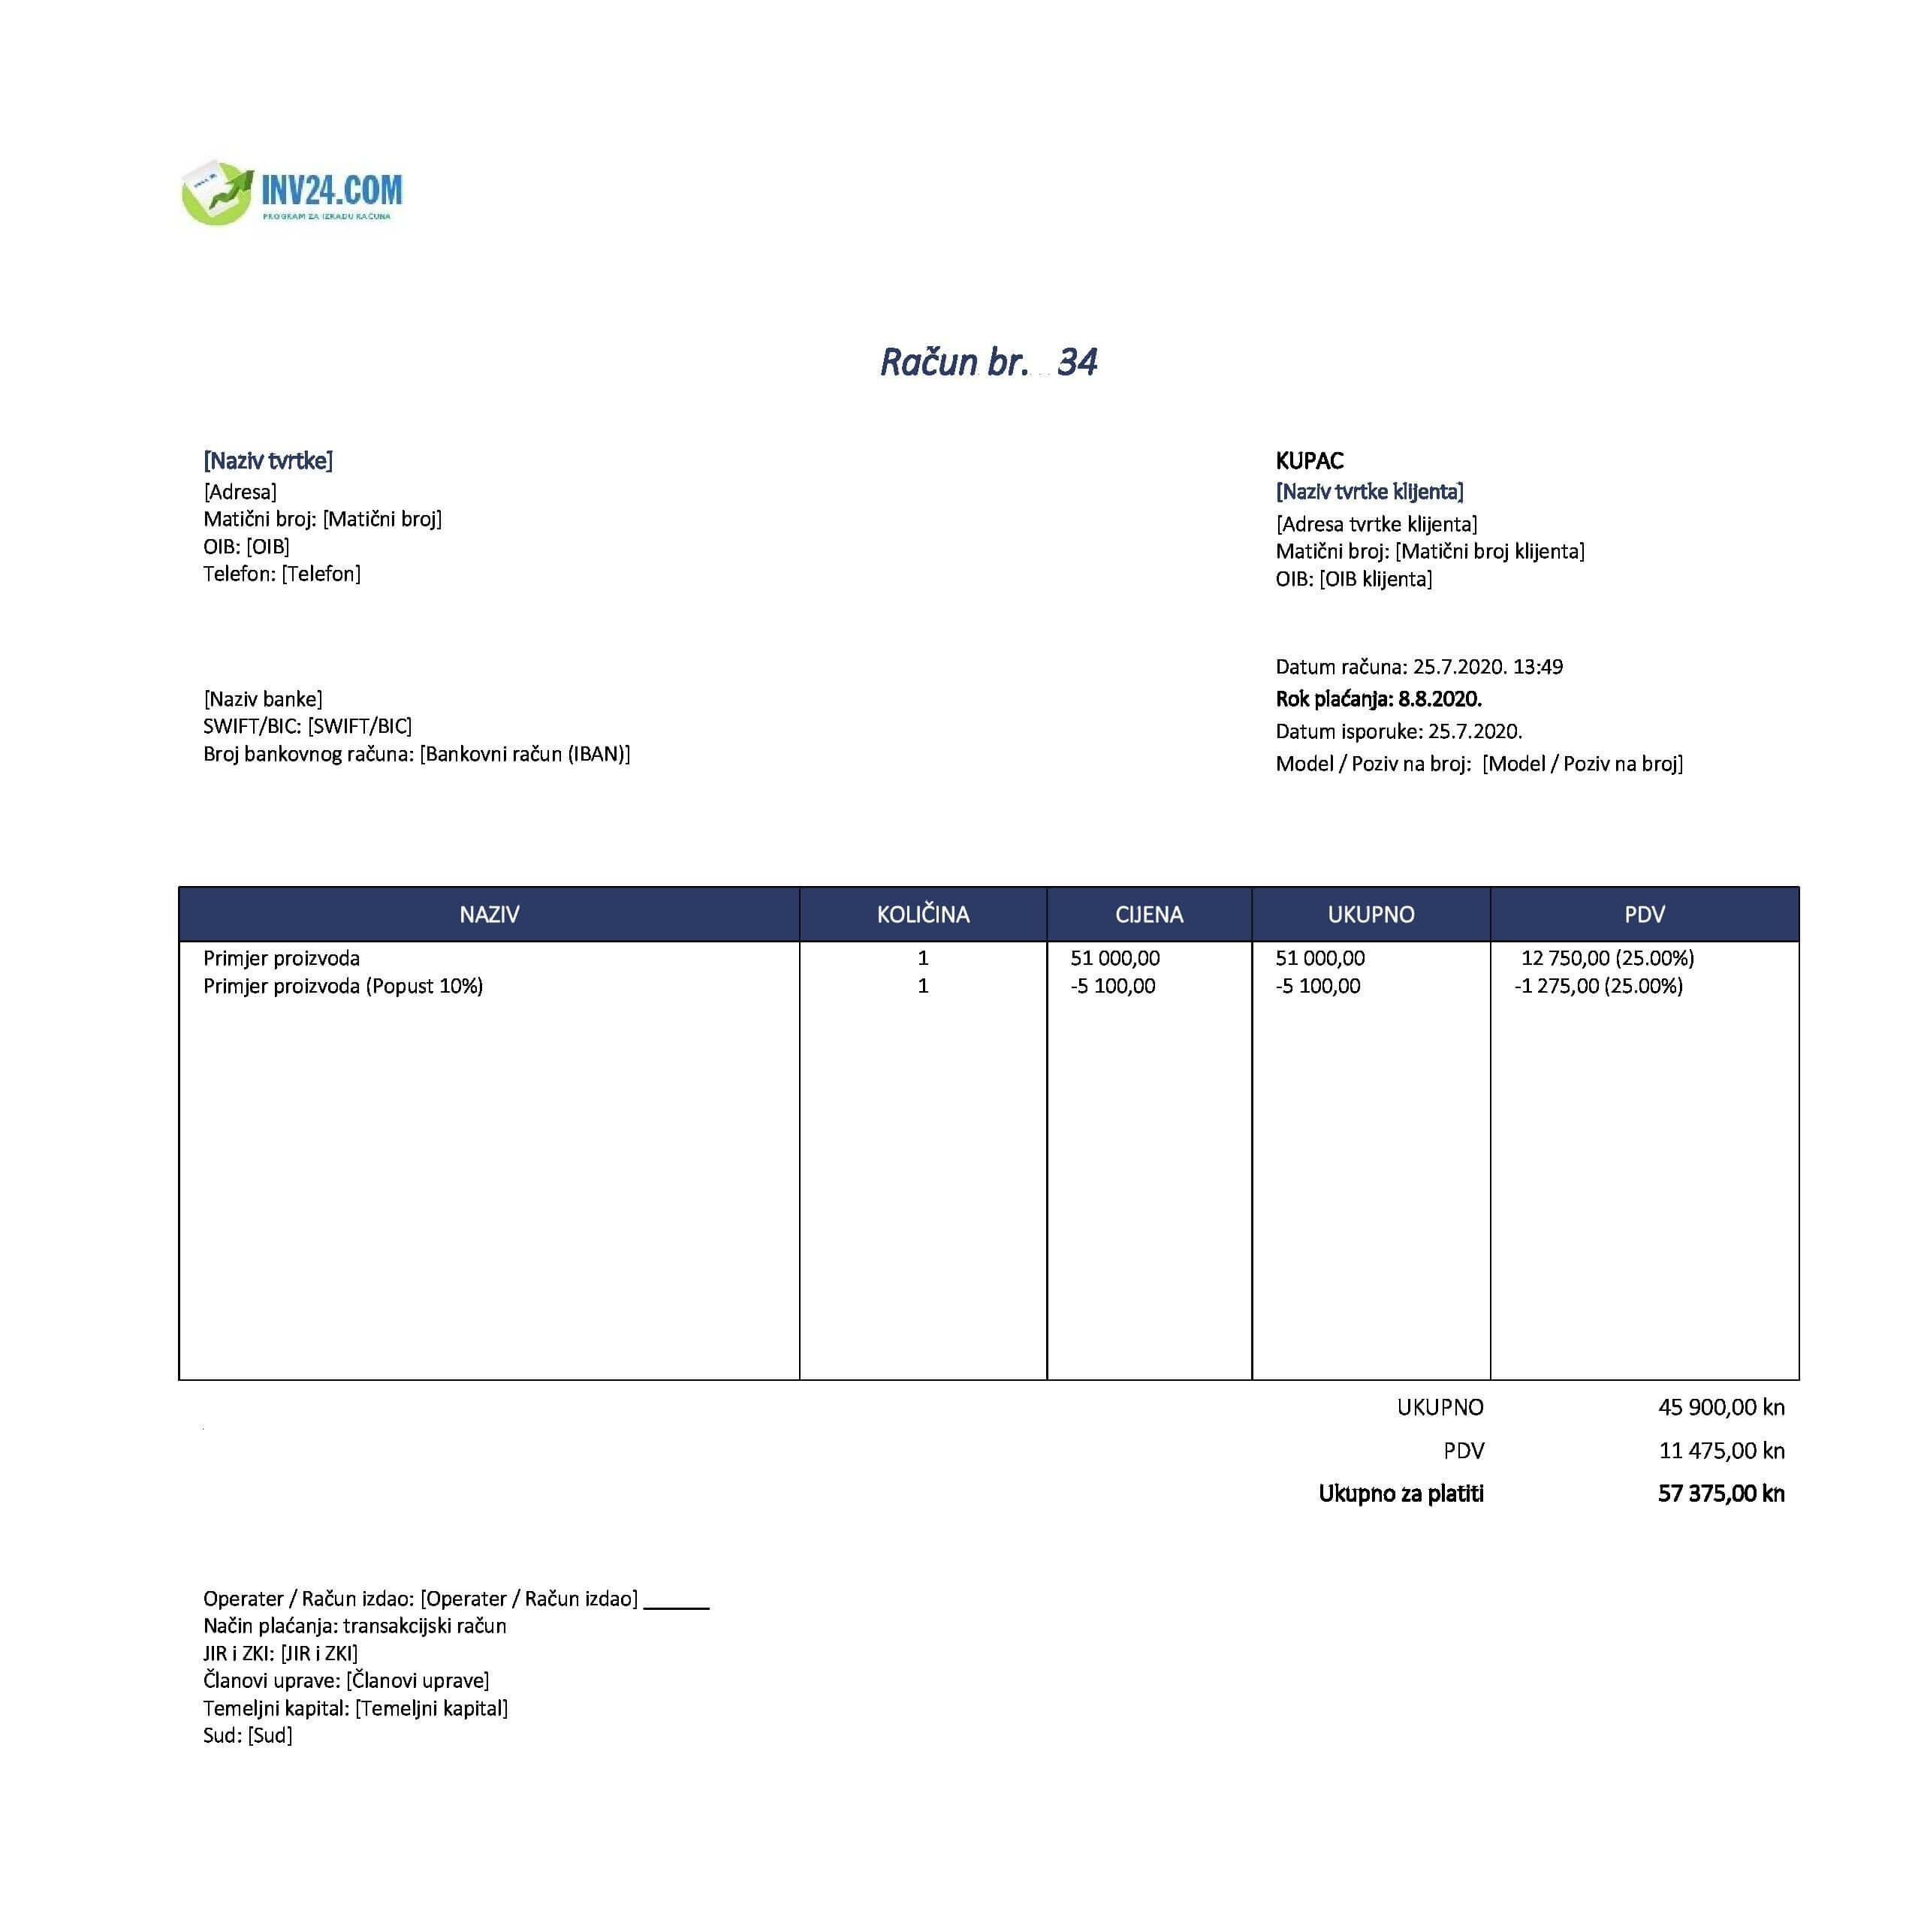 pdv faktura (račun)